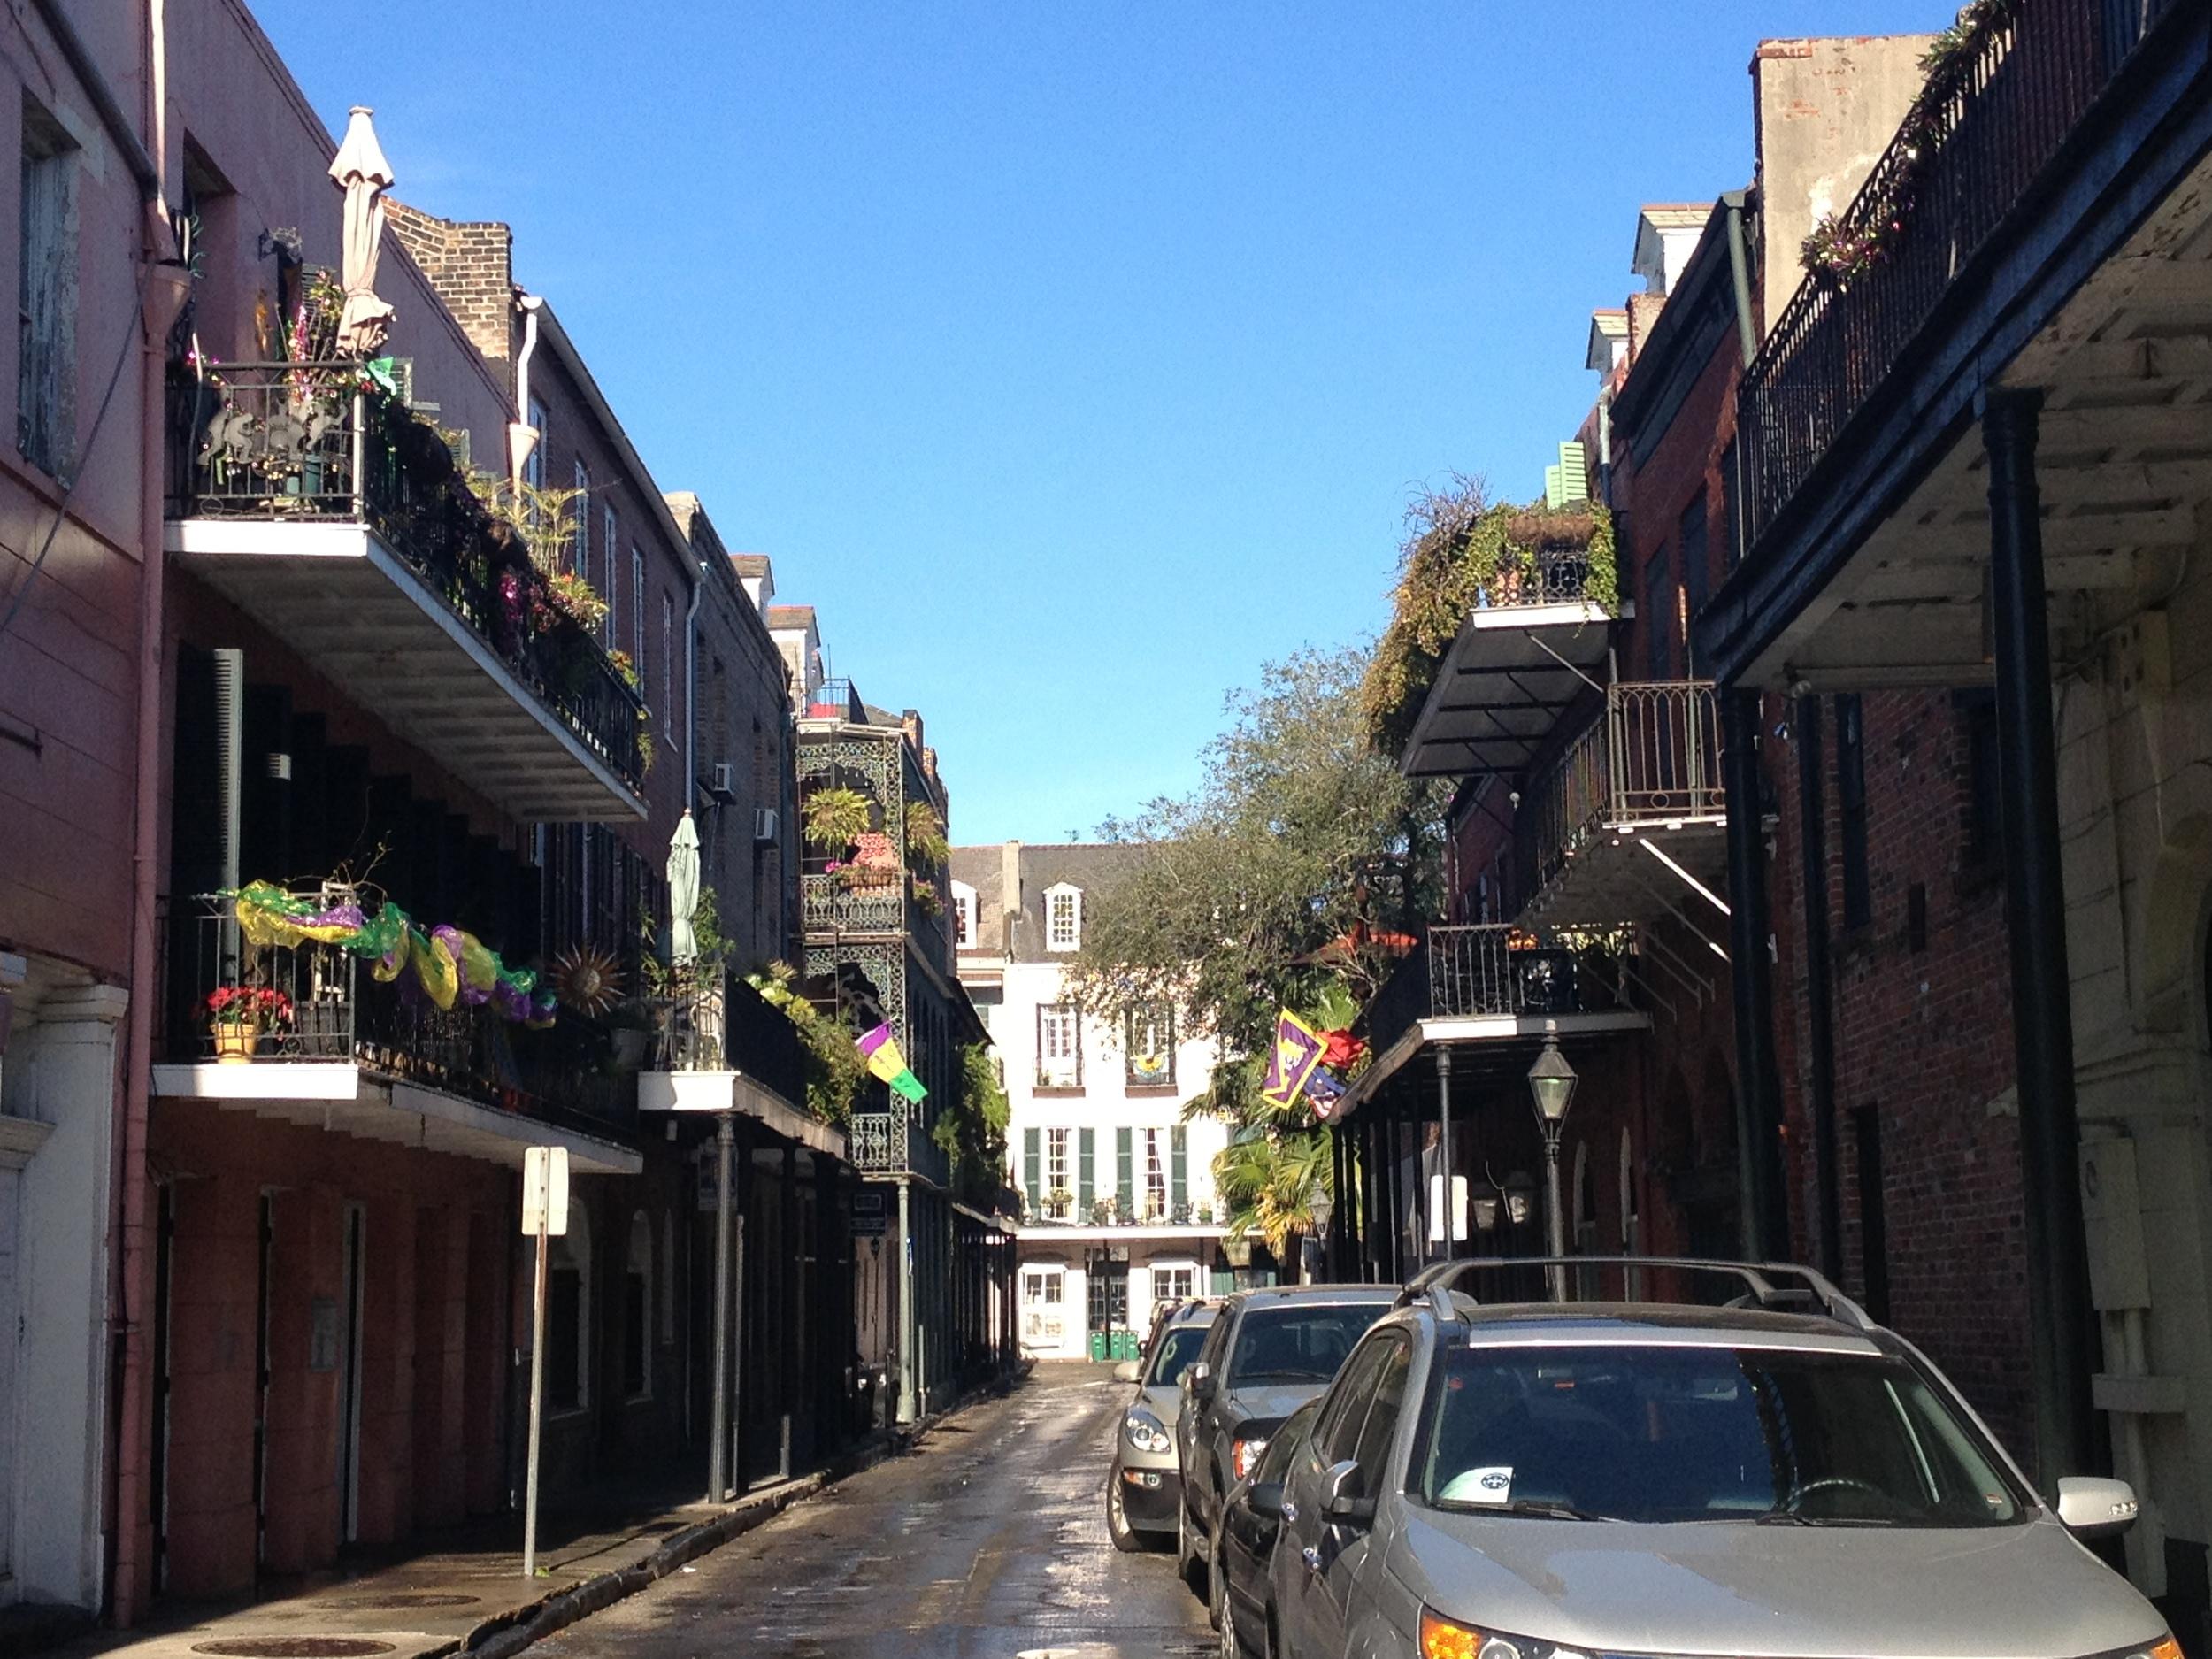 NOLA street